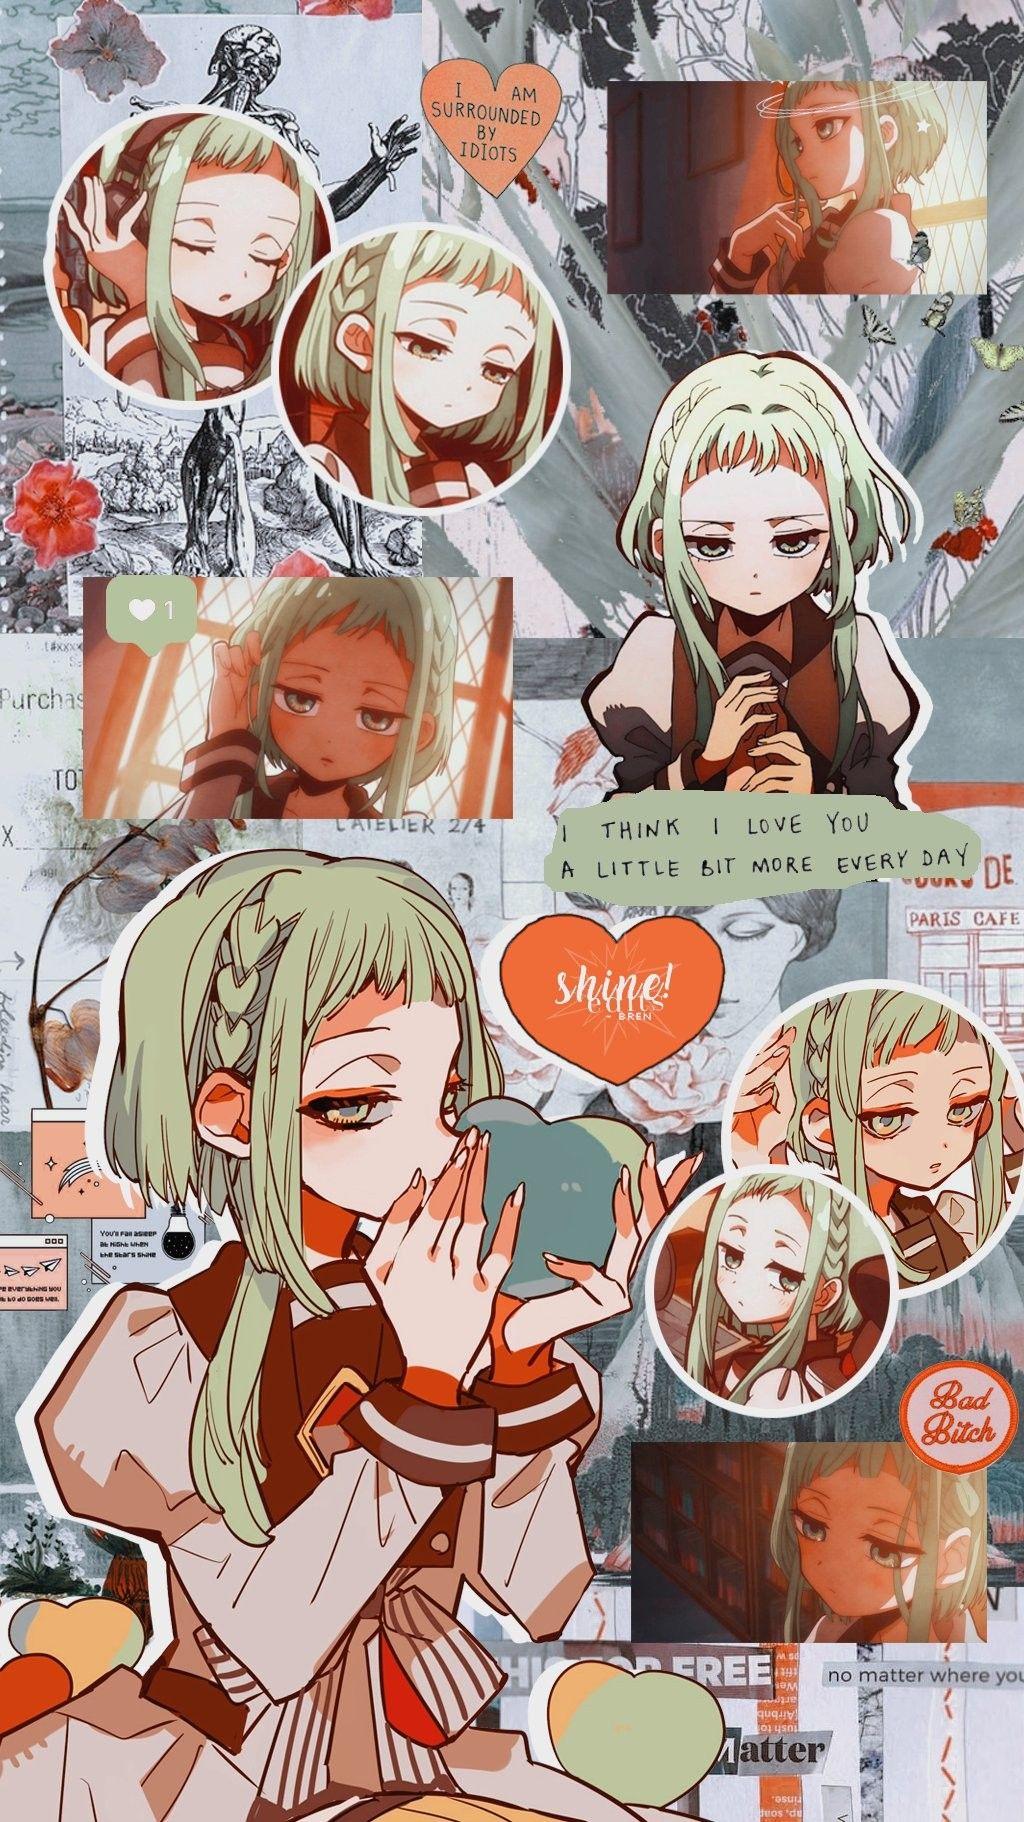 Sakura In 2020 Cute Anime Wallpaper Character Wallpaper Anime Wallpaper